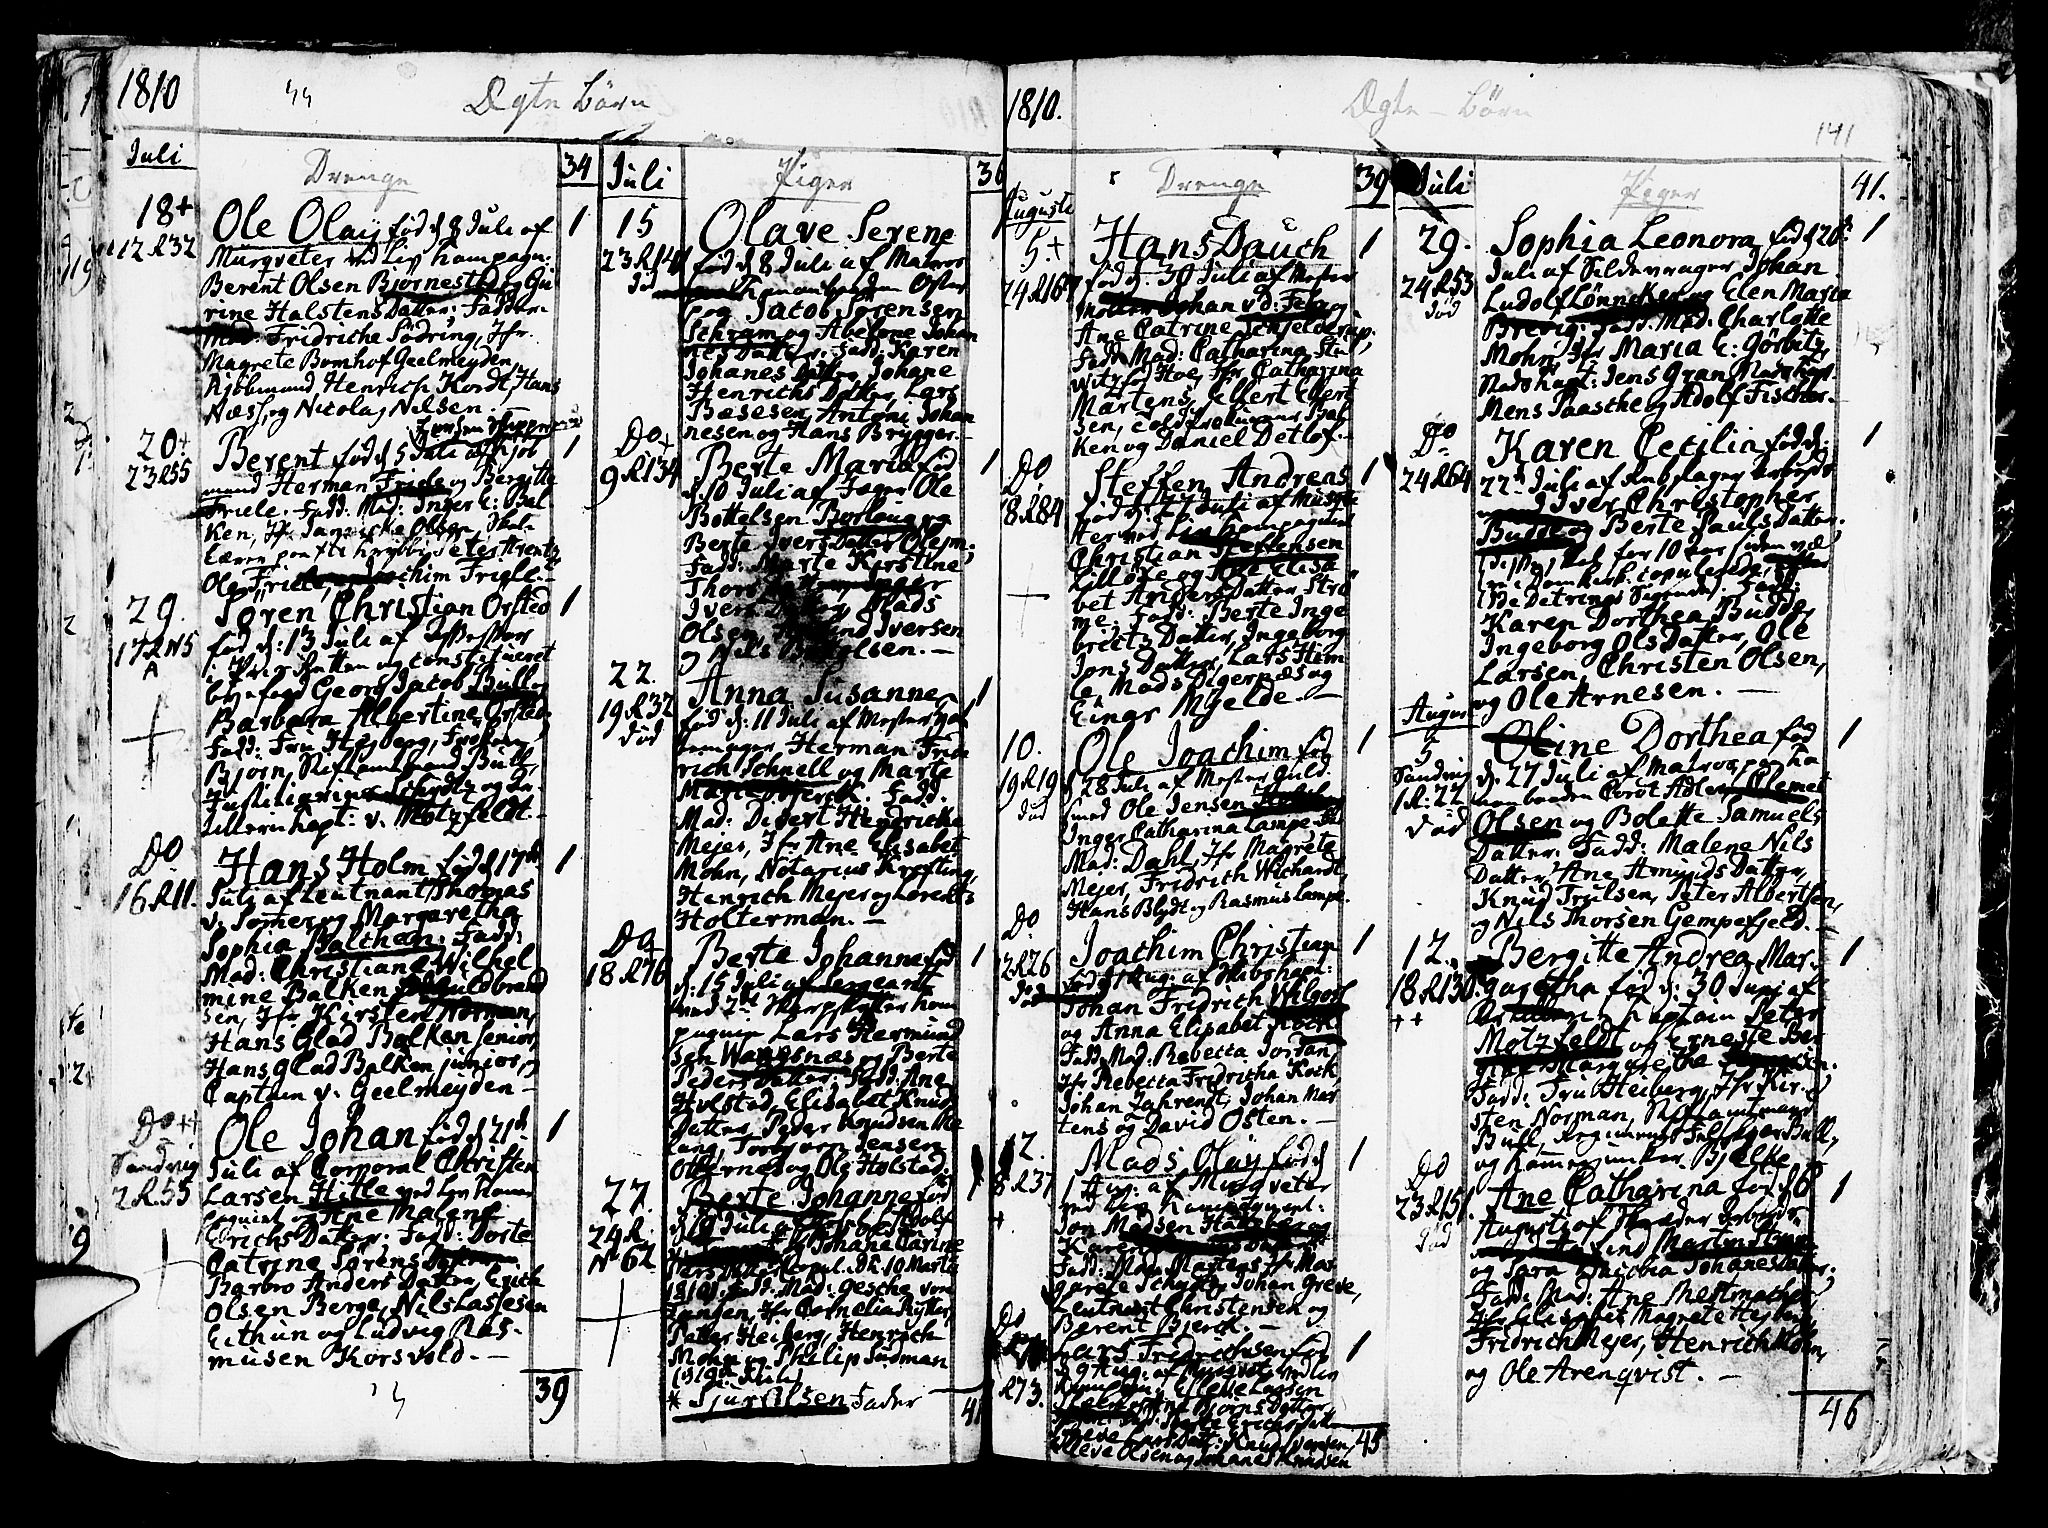 SAB, Korskirken Sokneprestembete, H/Haa/L0006: Ministerialbok nr. A 6, 1790-1820, s. 141